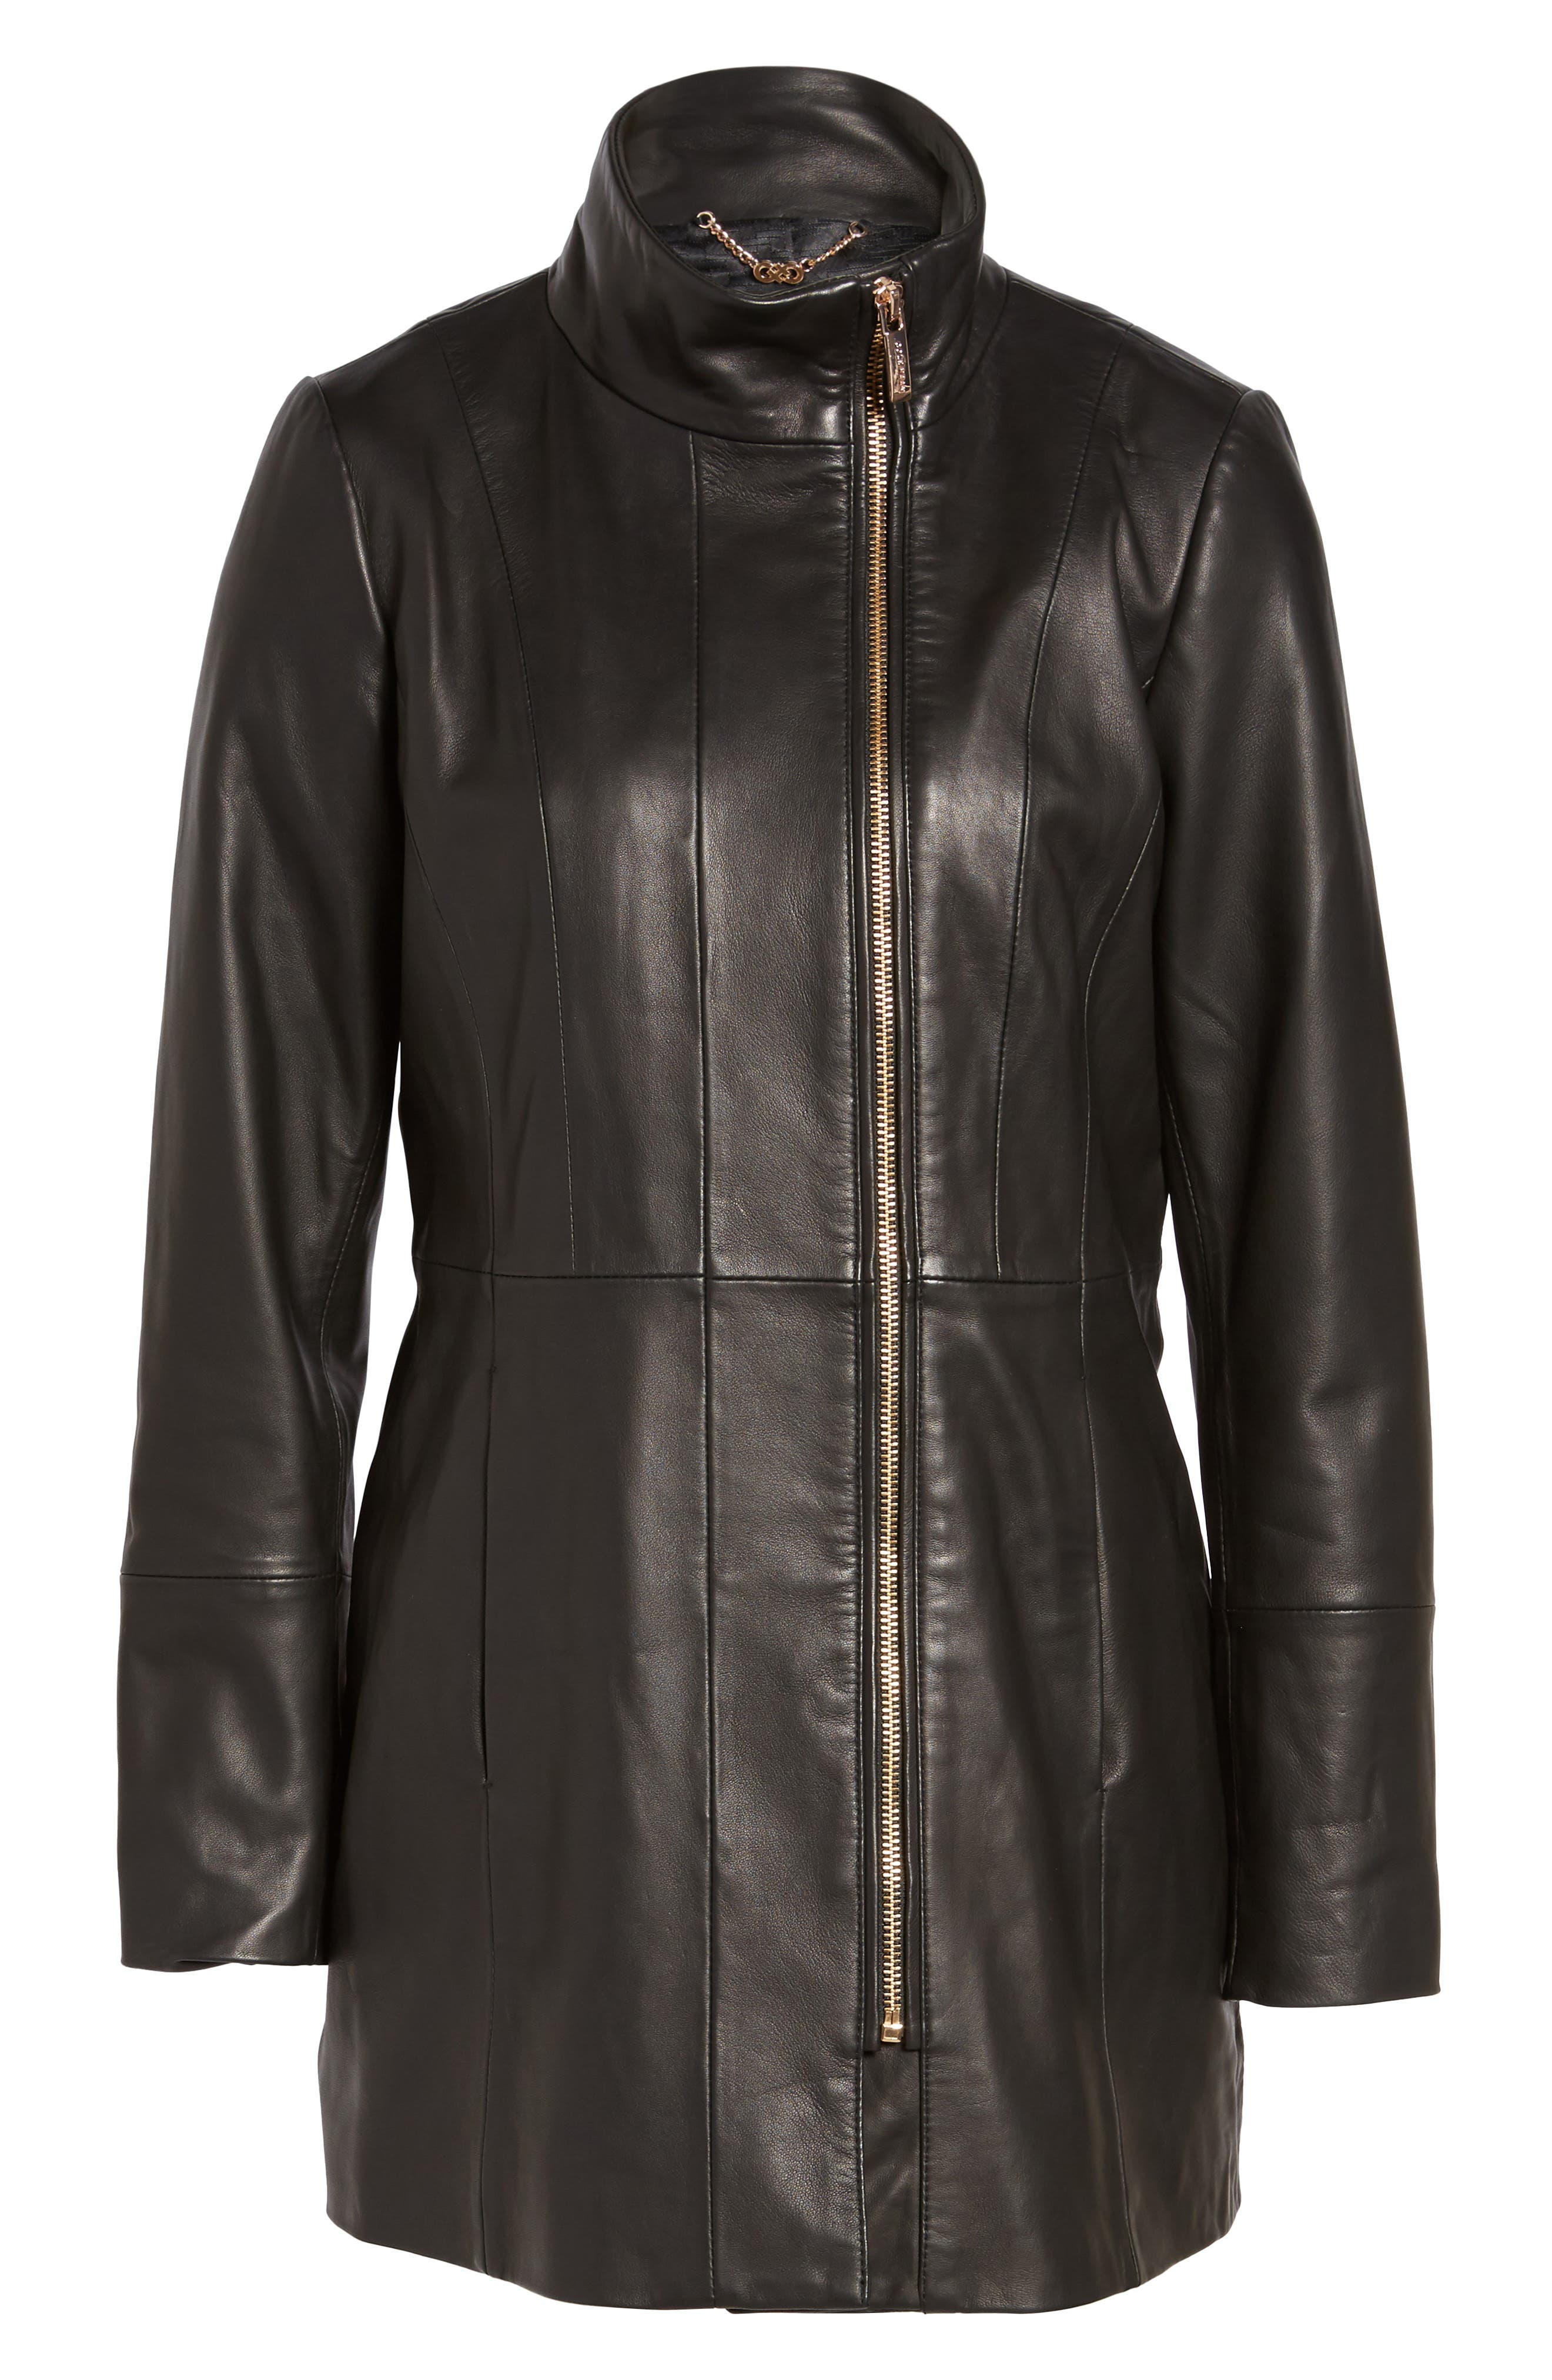 Leather Car Coat,                             Alternate thumbnail 6, color,                             Black